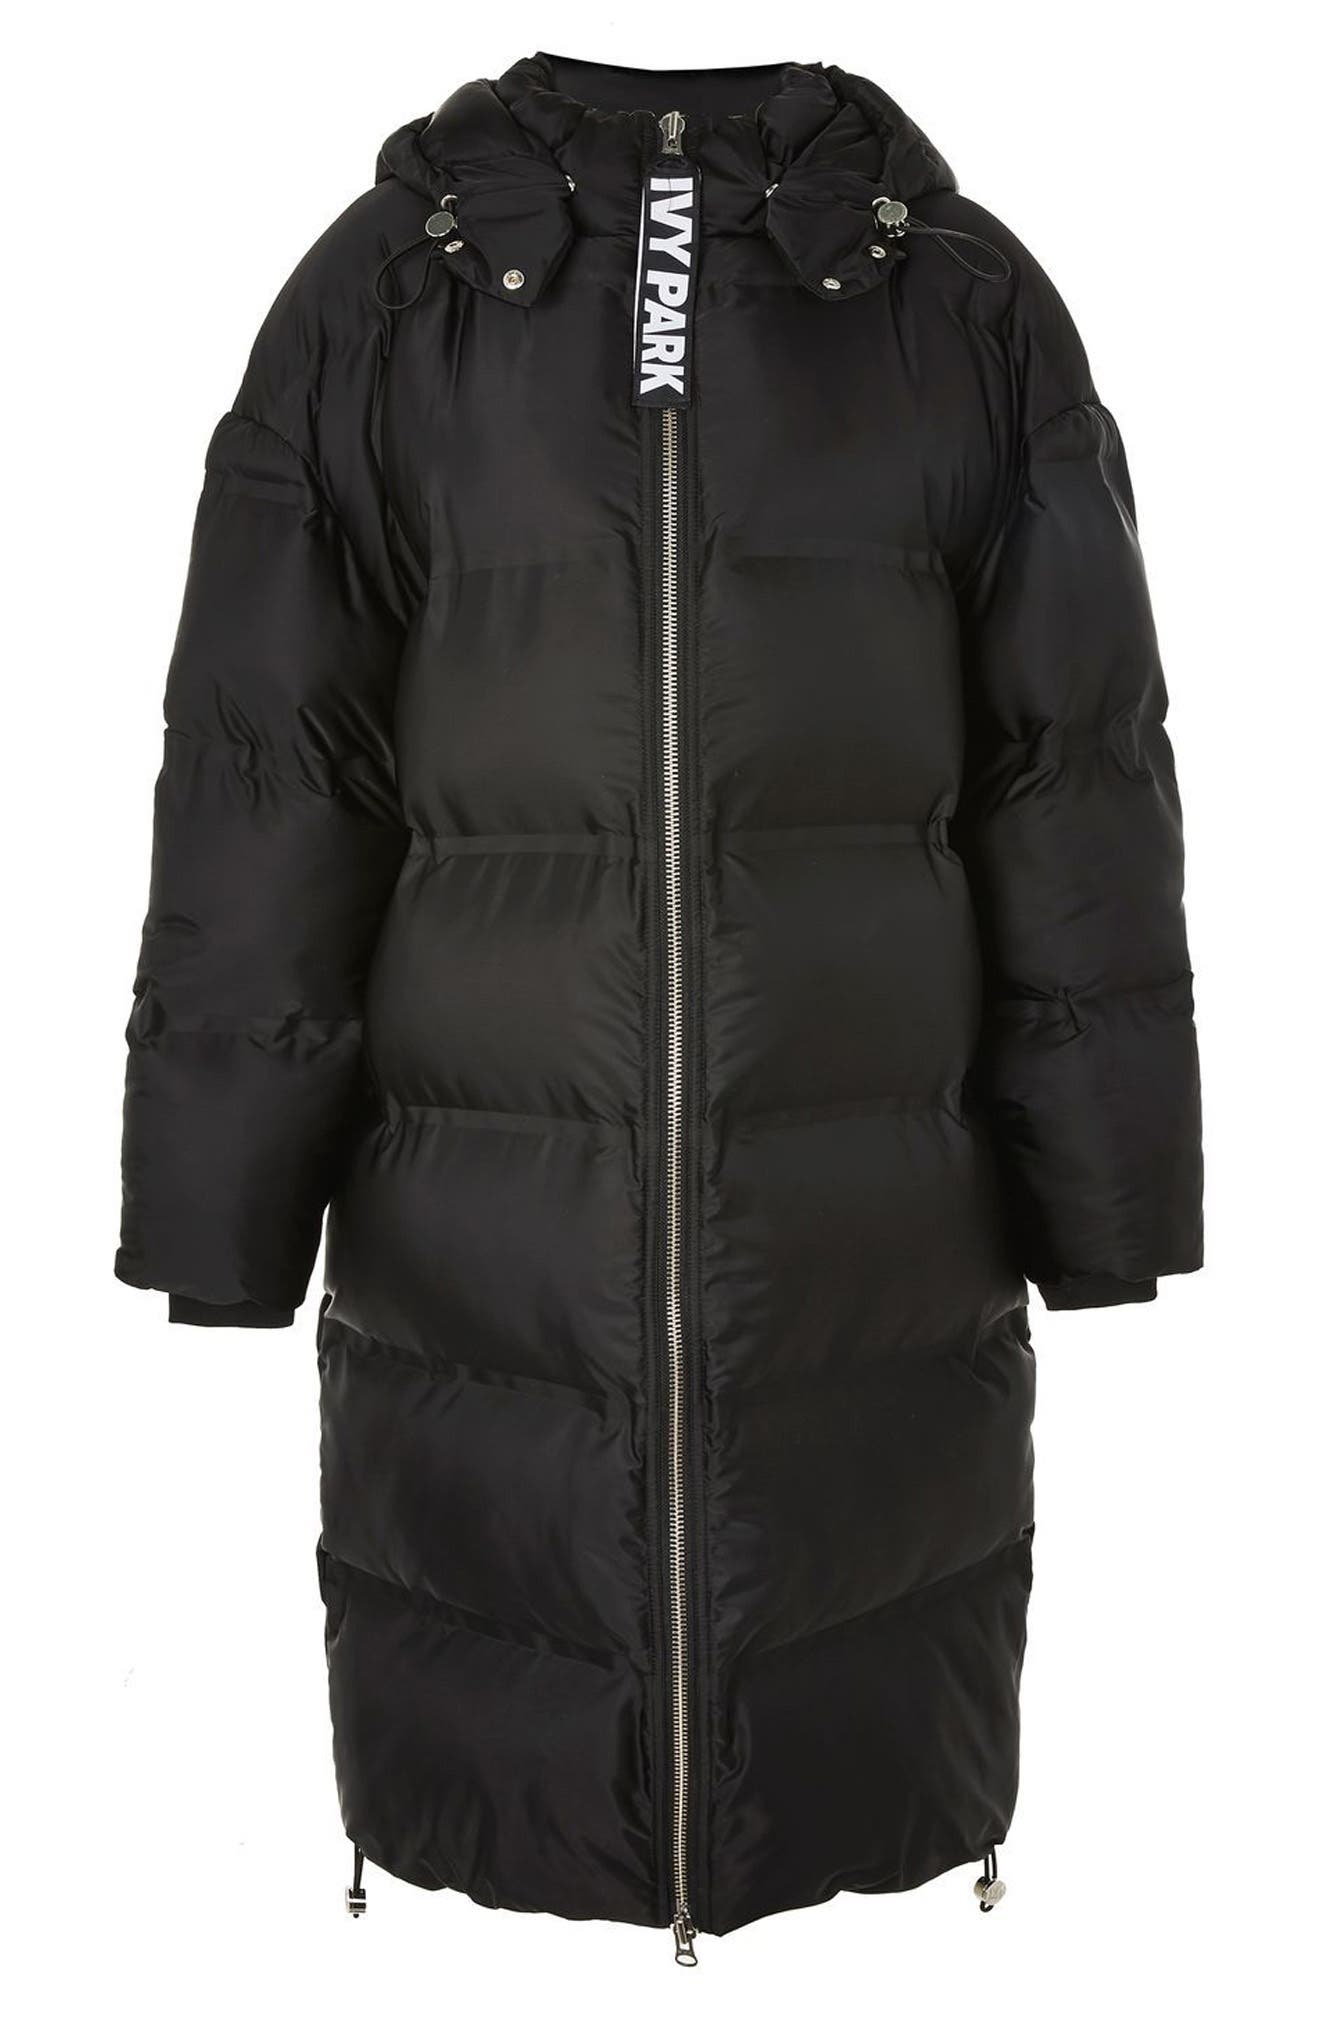 IVY PARK® Longline Bonded Puffer Jacket